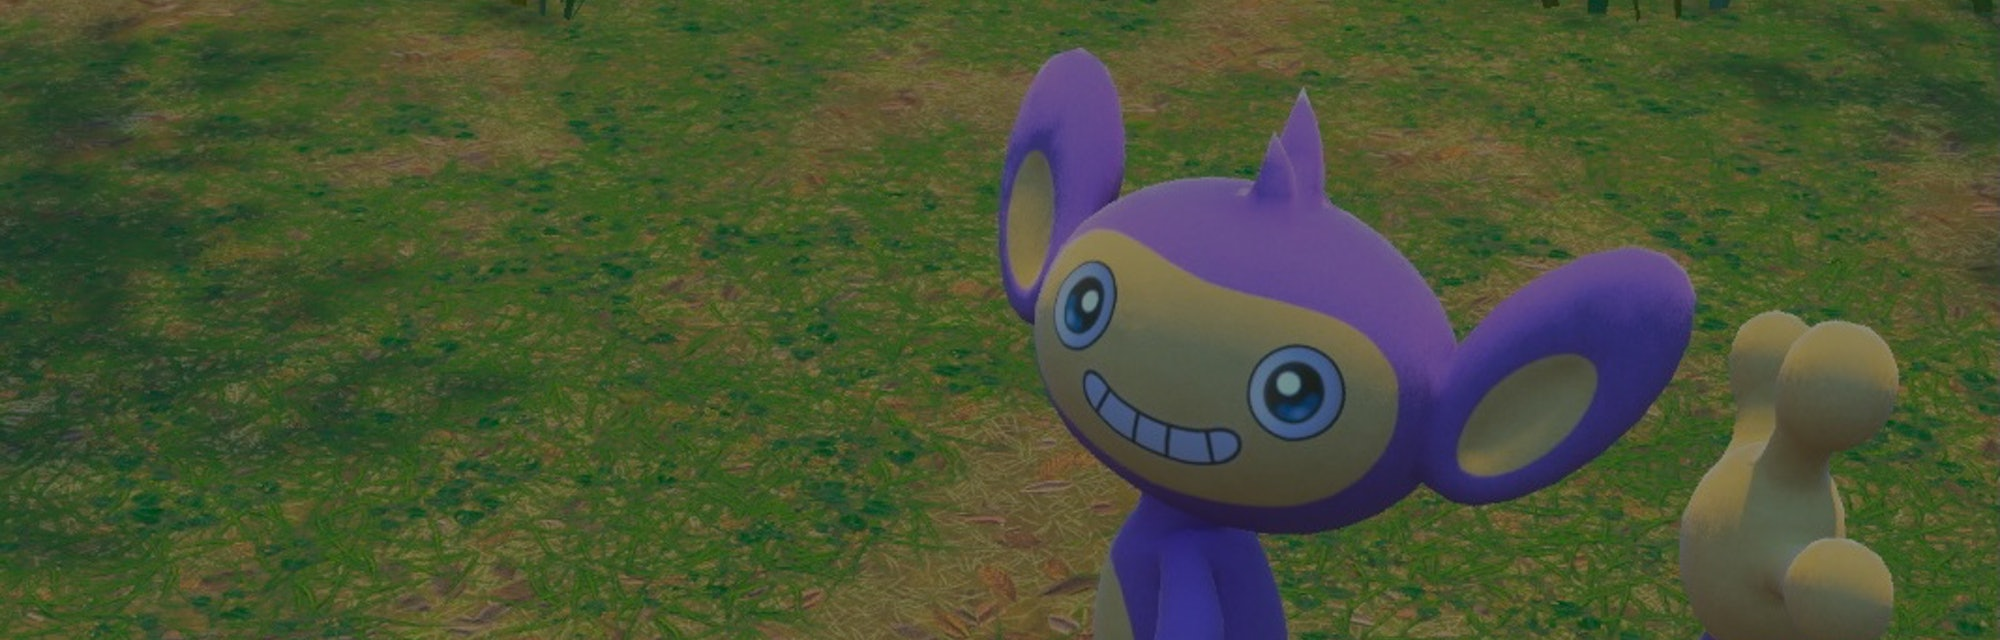 A Pokémon smiling